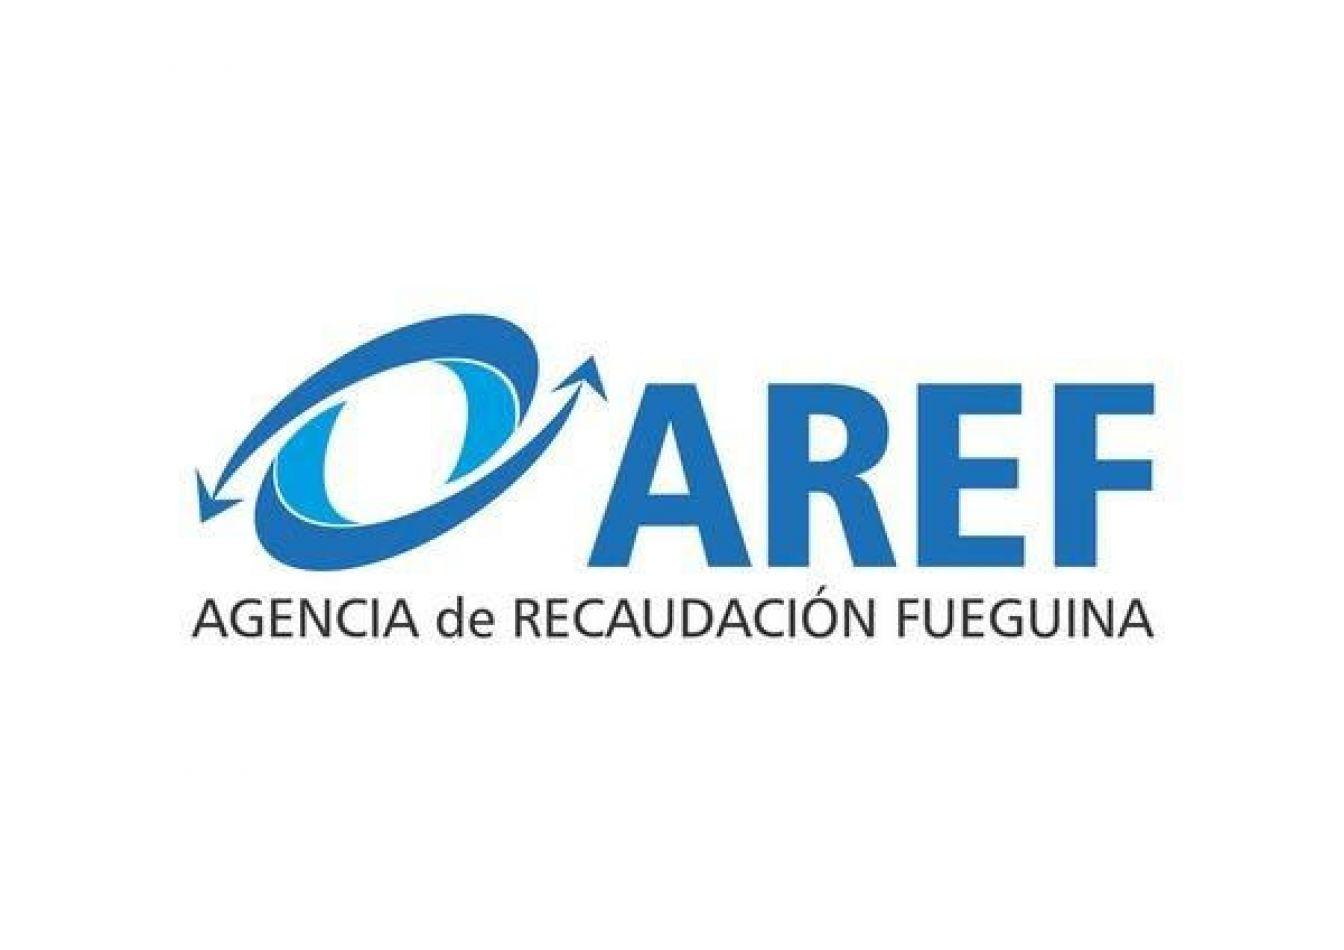 Agencia de Recaudación Fueguina (AREF)